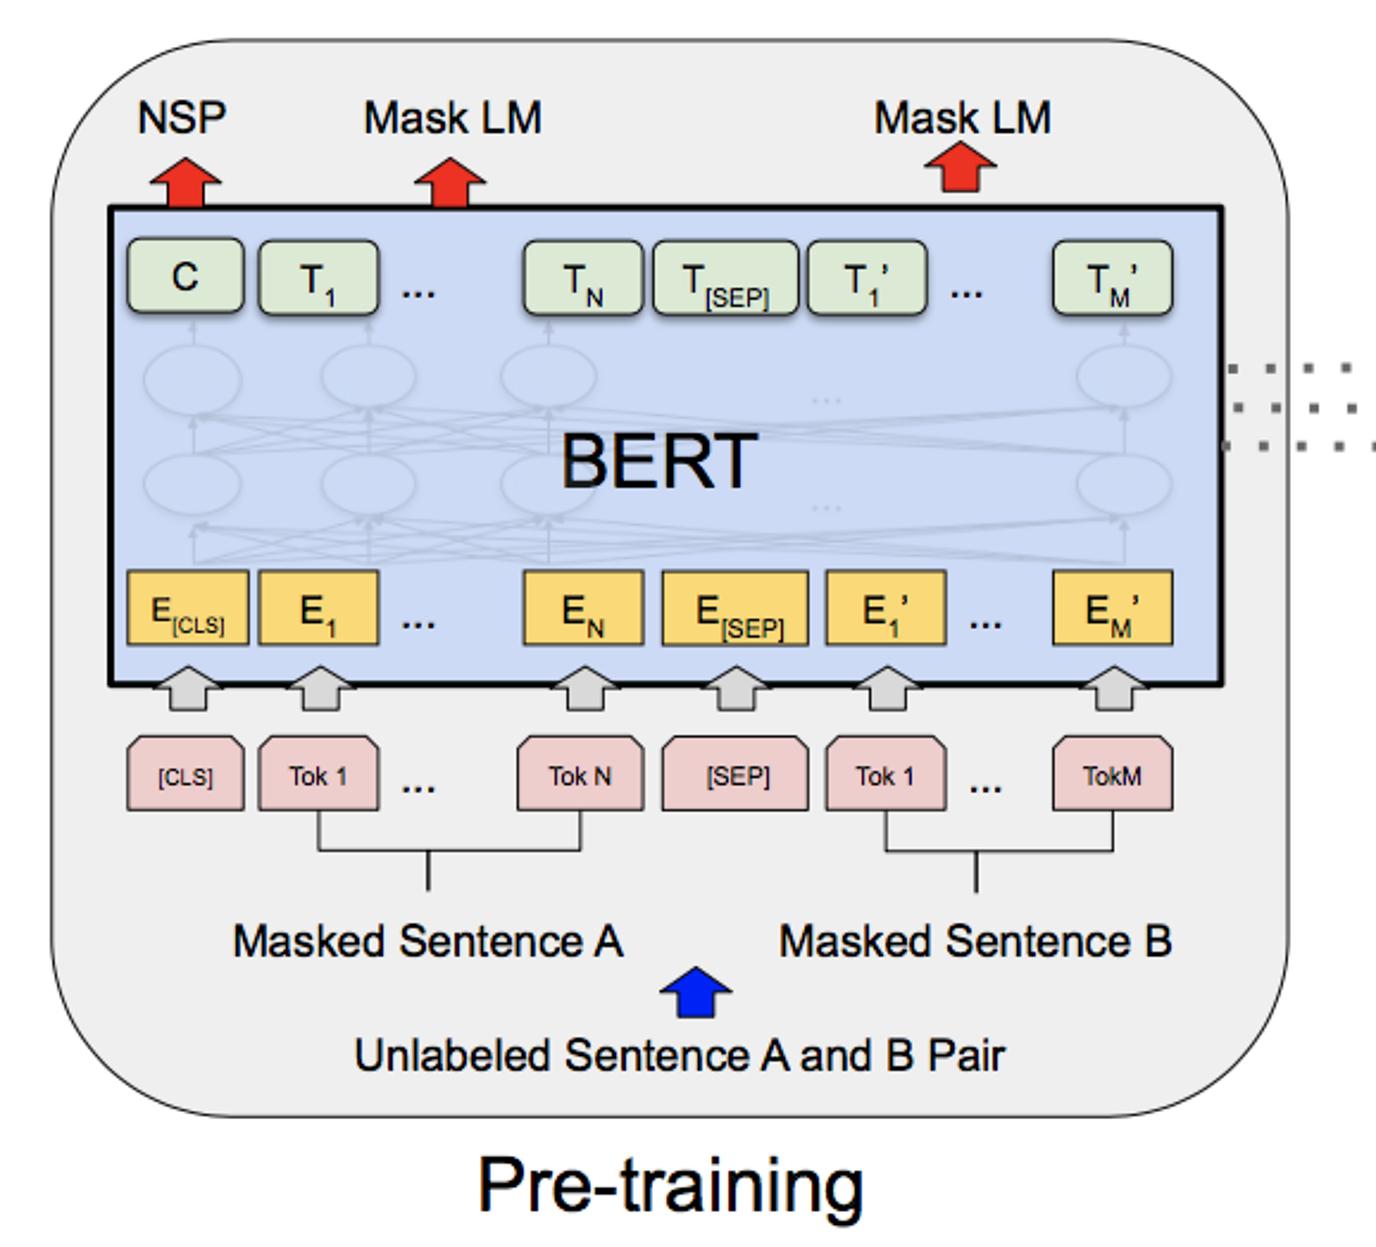 BERTのモデル構造